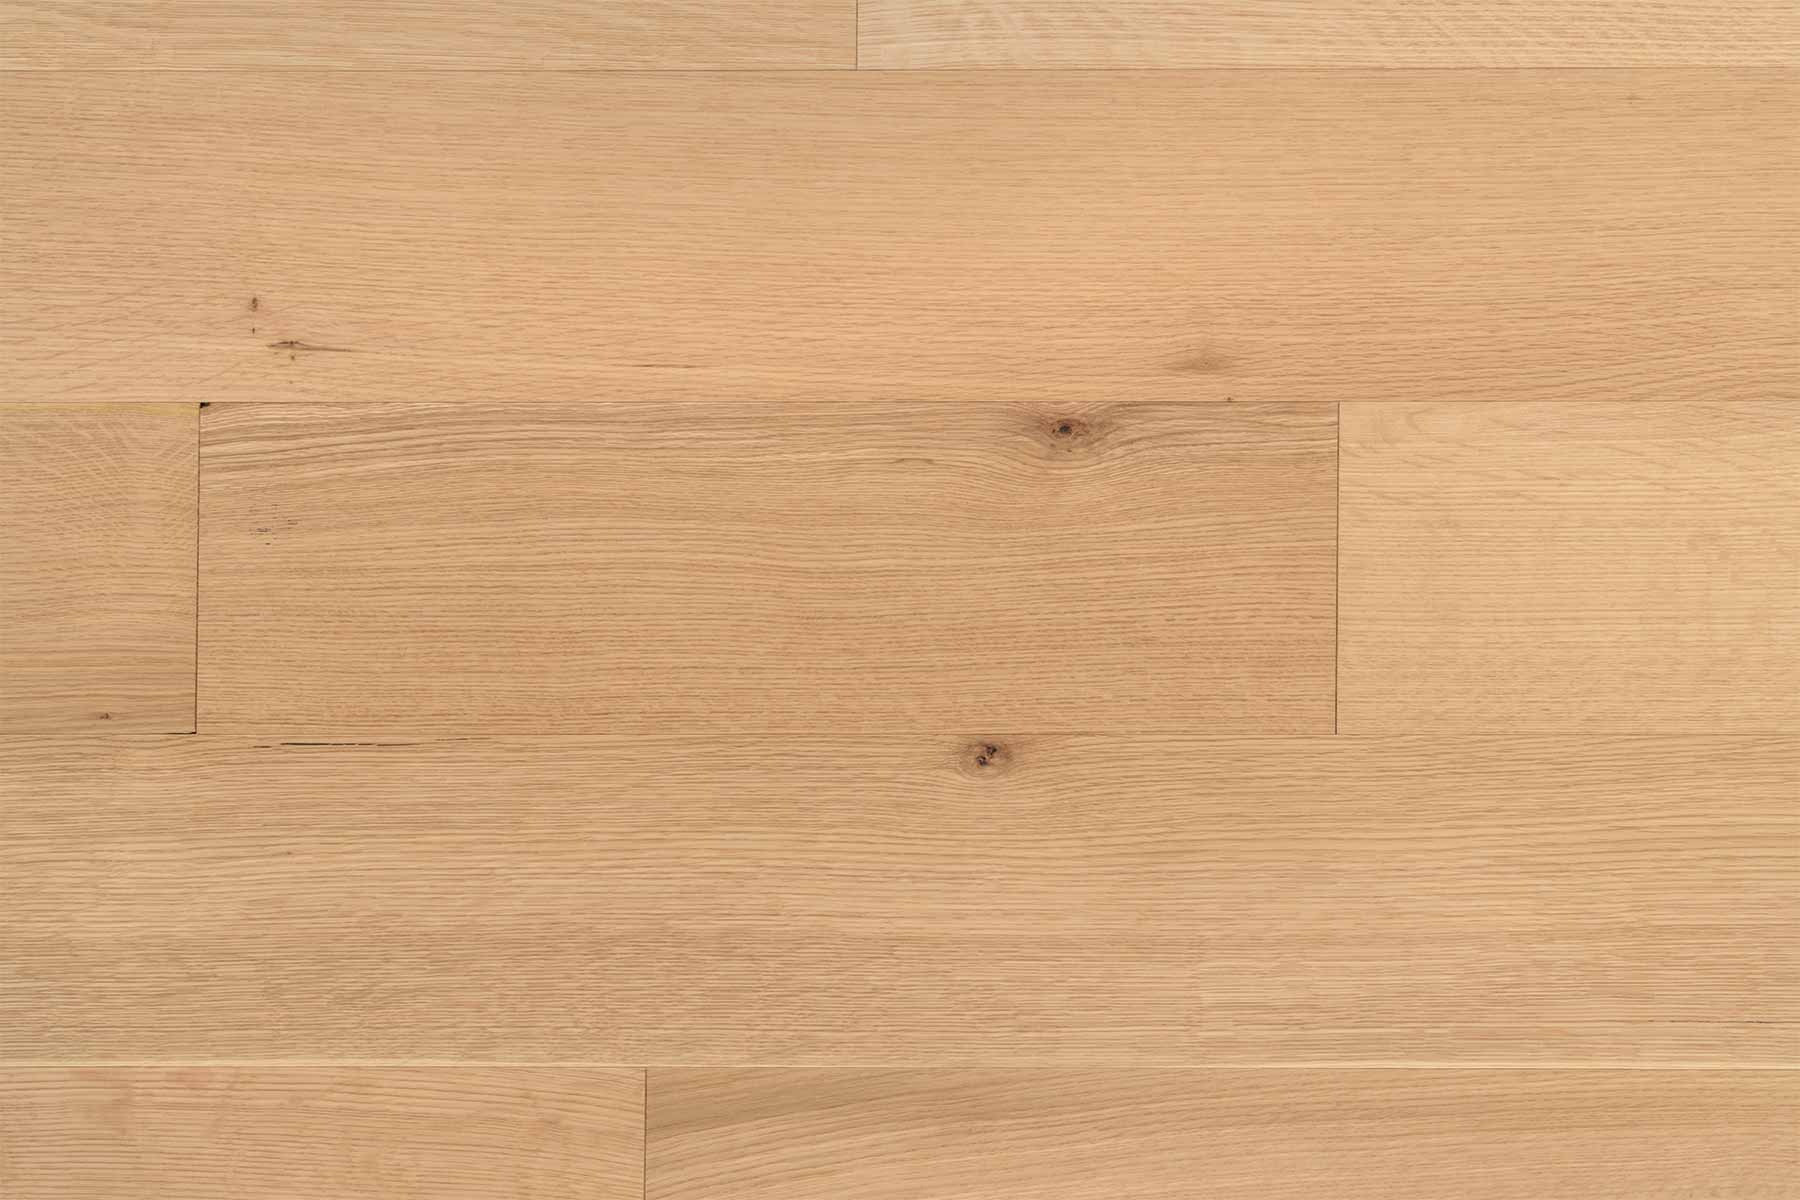 shaw bamboo hardwood flooring of 28 new handscraped engineered hardwood photos flooring design ideas intended for gallery of 28 handscraped engineered hardwood